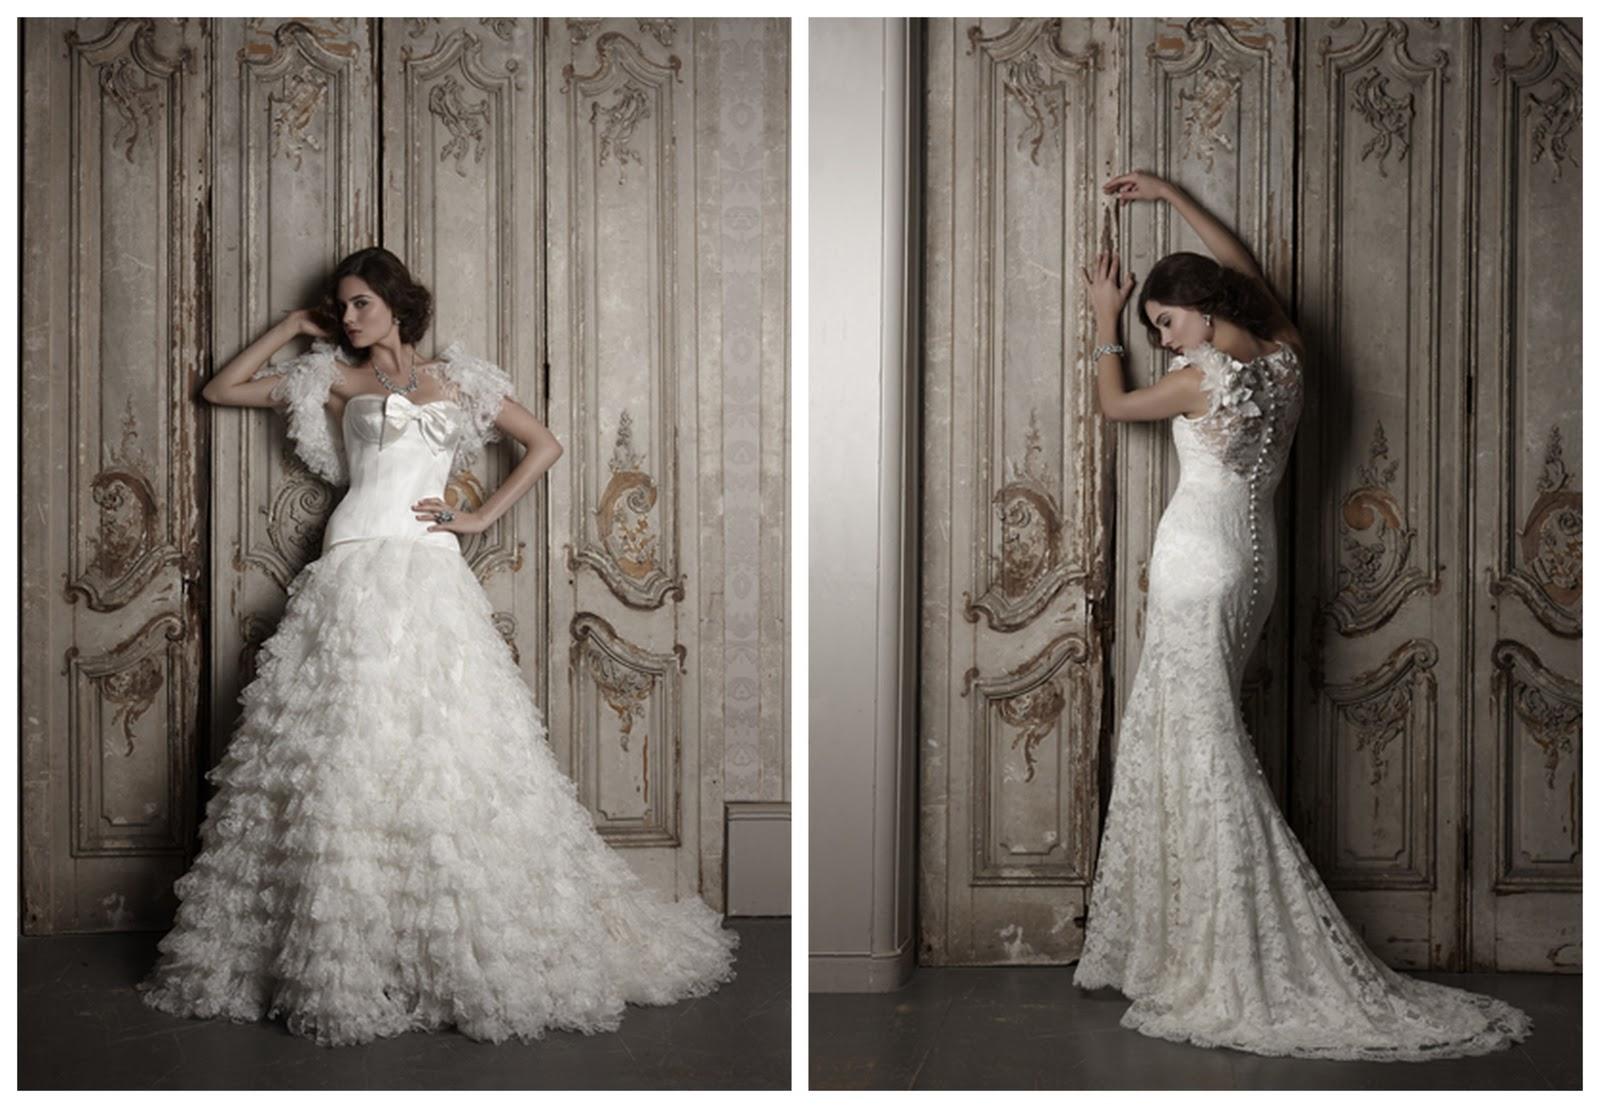 jcrew karlie ball gown wedding dress wedding dresses for sale J Crew Karlie Ball Gown Wedding Dress